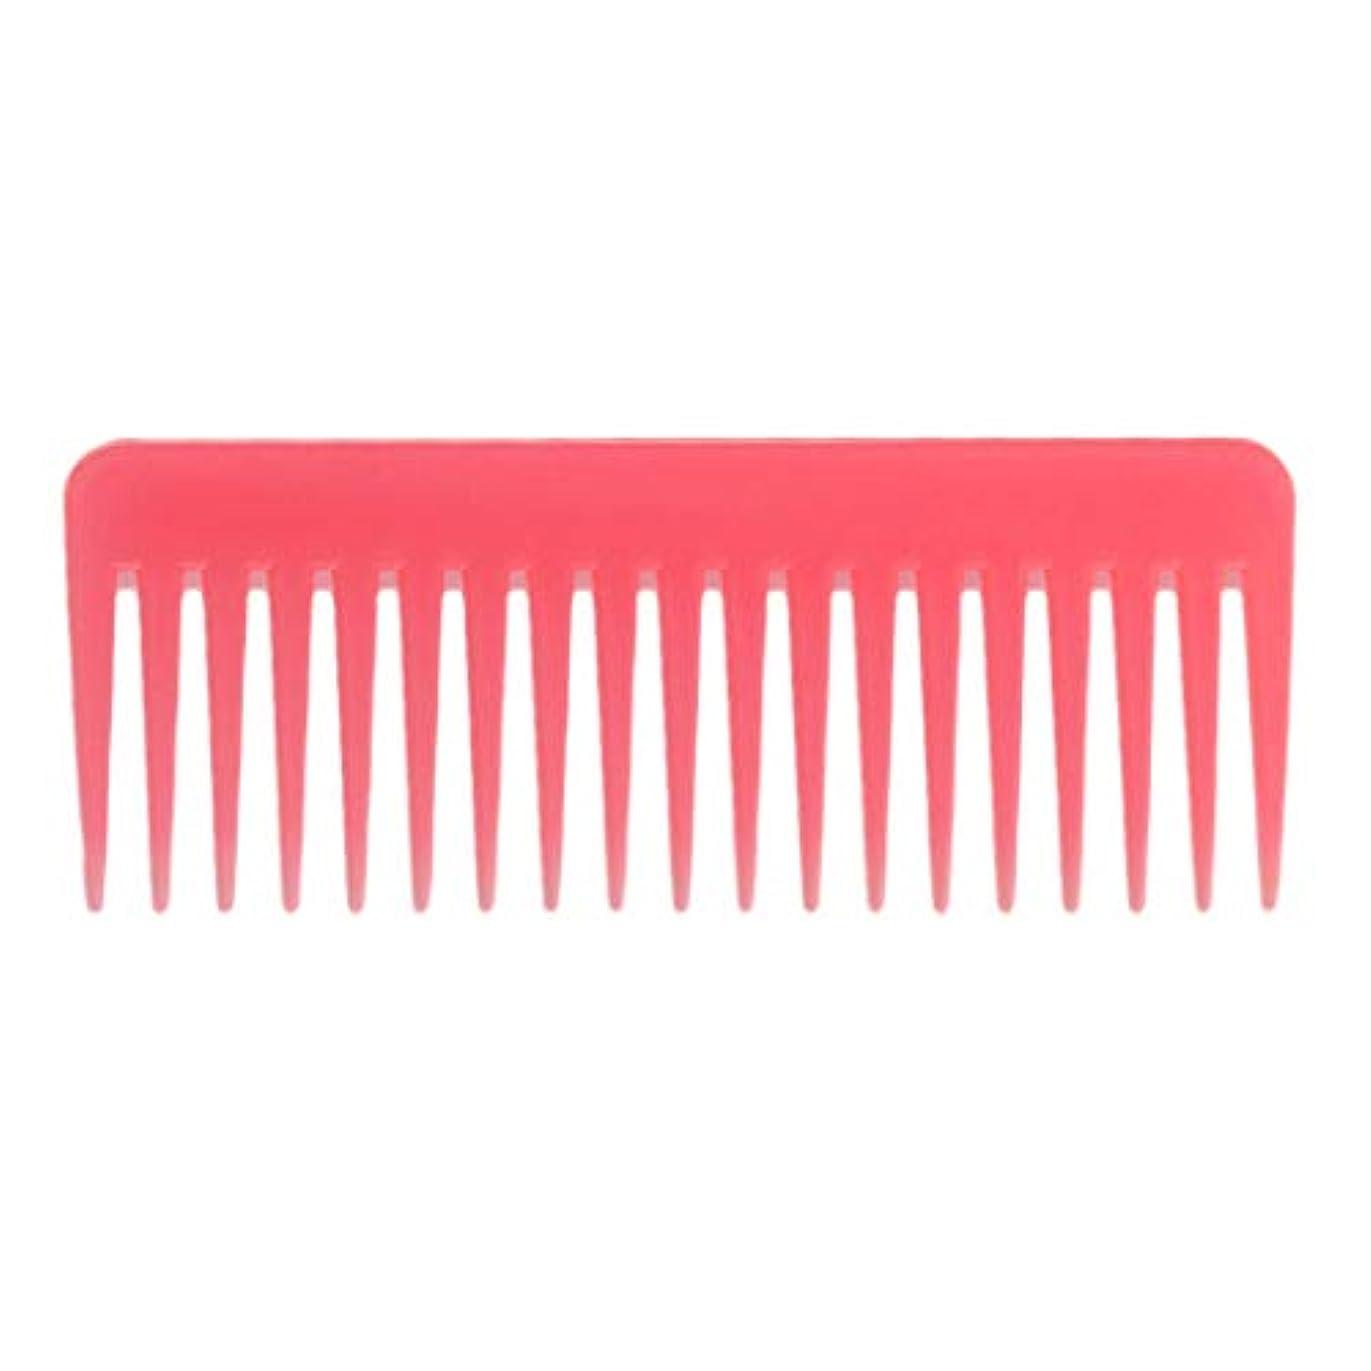 Toygogo 巻き毛の太い髪用の広い歯のもつれのくしサロンシャンプーヘアブラシくし、6.1 ' - ピンク